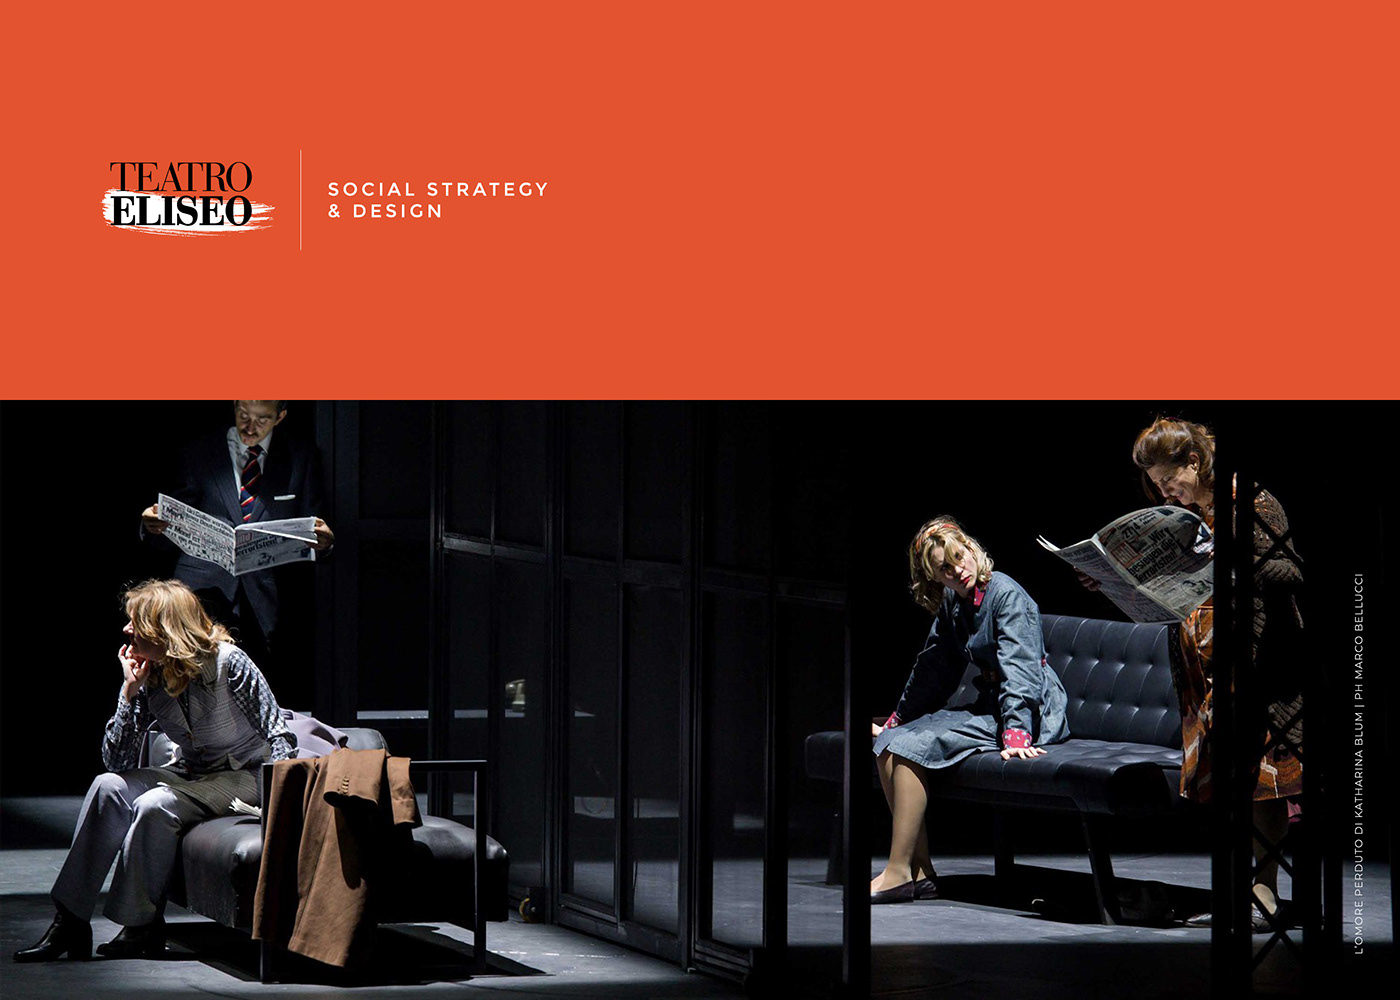 desing facebook format instagram orange post social Stories Teatro Eliseo theater